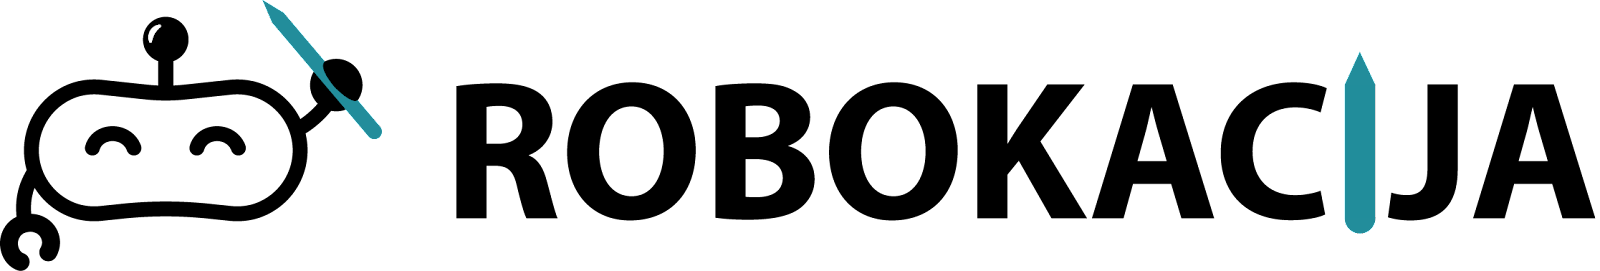 Macintosh HD:Users:ikunovic:Desktop:REFERENCE:DIZAJN robokacija logo:RobokacijaLogoLong.png